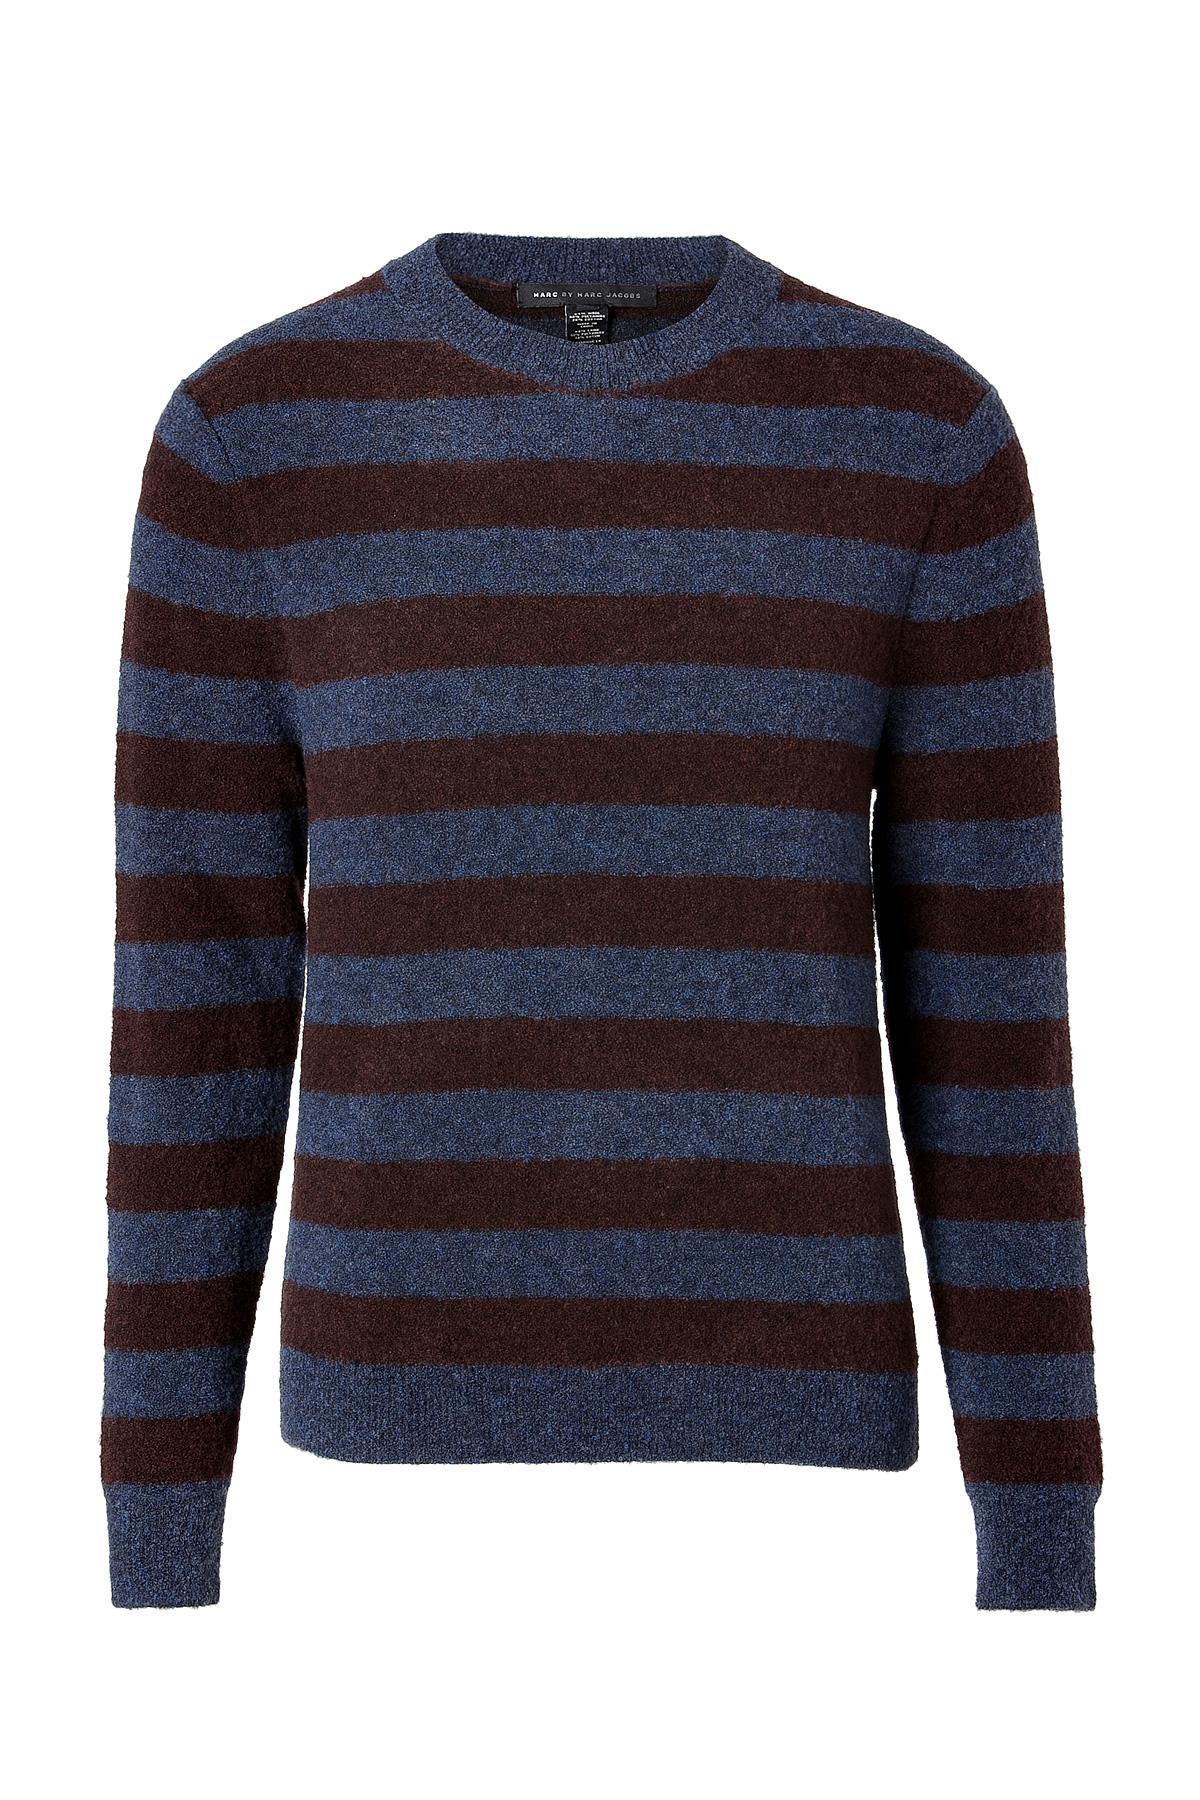 marc by marc jacobs wool cotton striped pullover in sailor navy melange multi in blue for men lyst. Black Bedroom Furniture Sets. Home Design Ideas